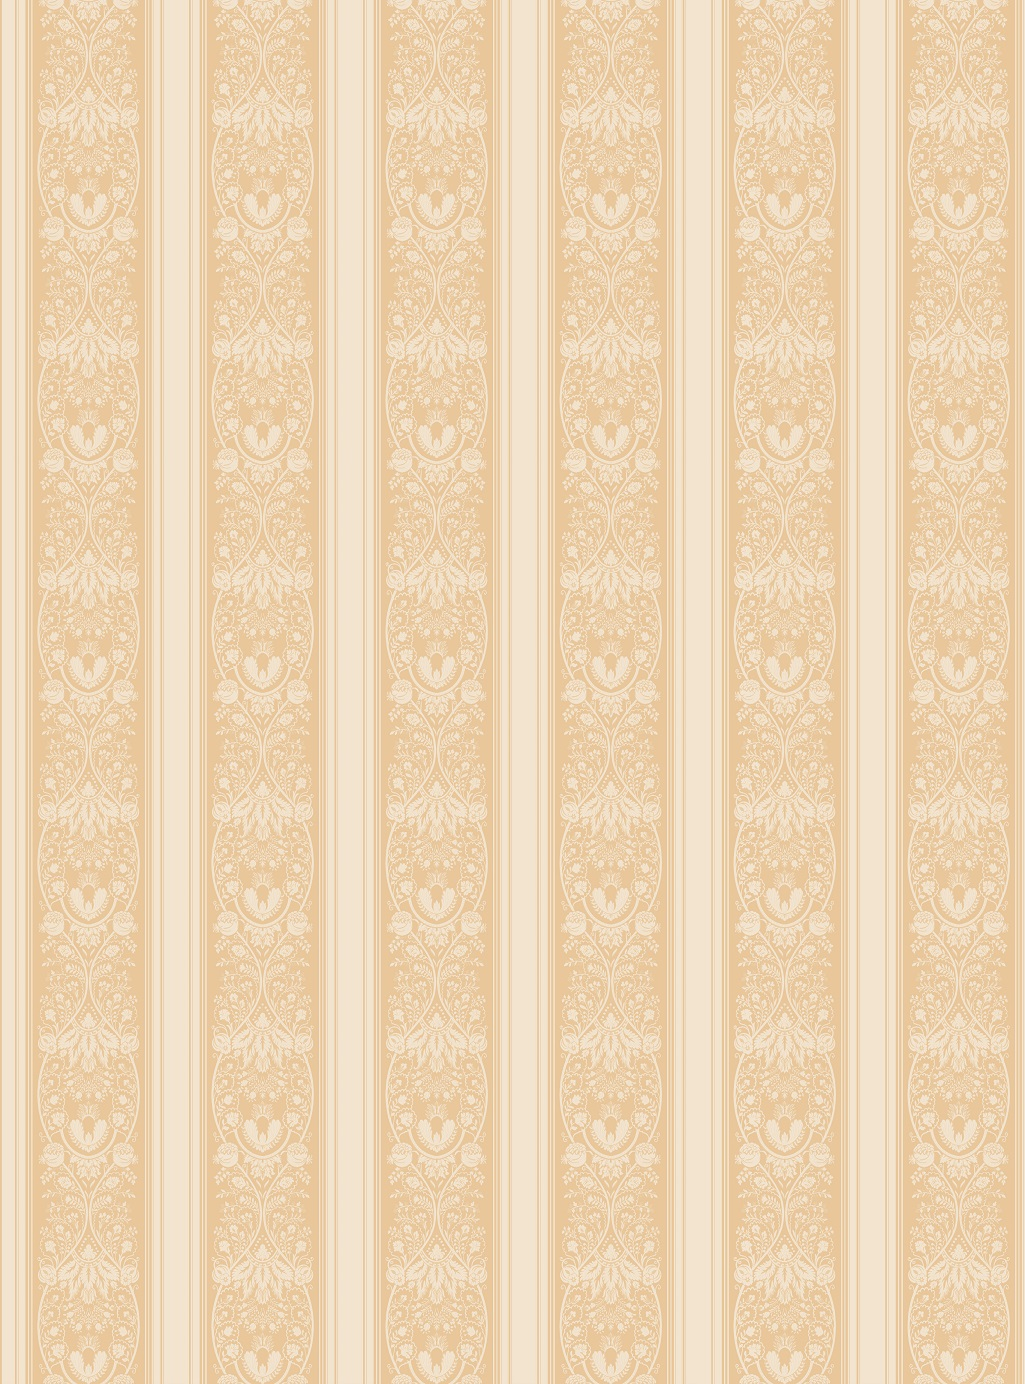 Итальянские обои Manifattura di Tizzana,  коллекция Collezione 01-03, артикул01-1231